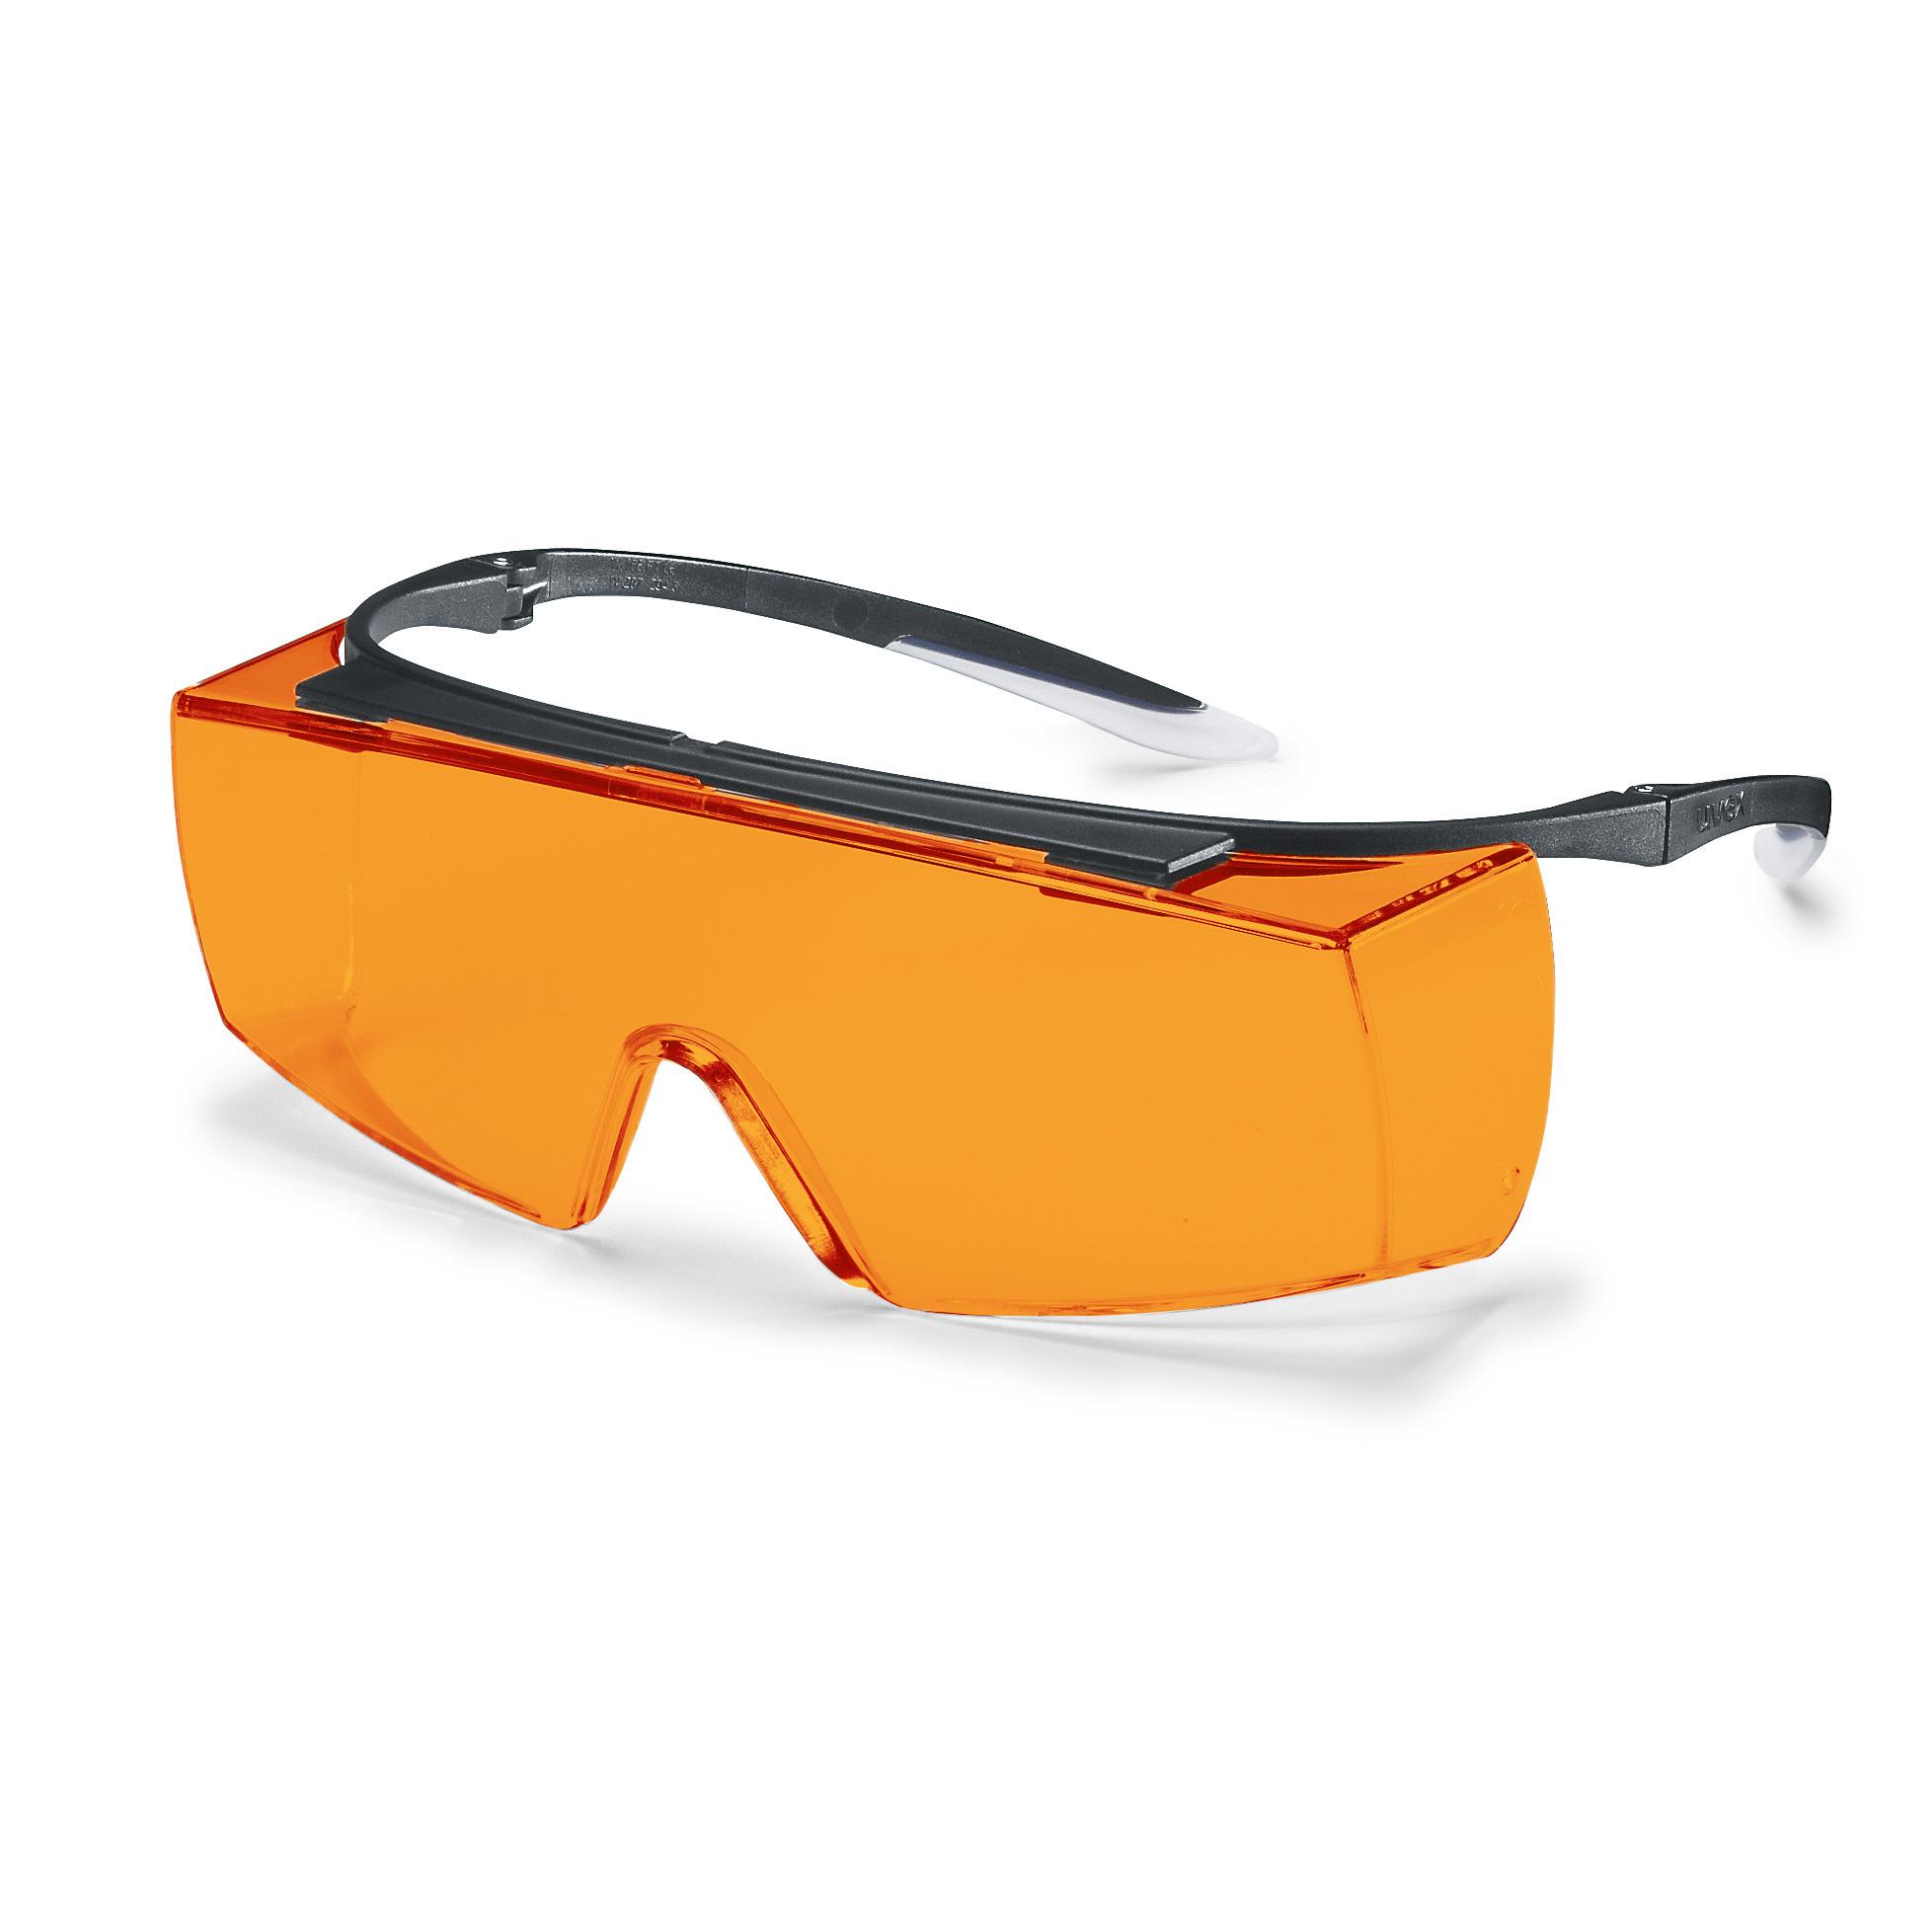 uvex super f OTG spectacles   Safety glasses   uvex safety 1b87d656751a